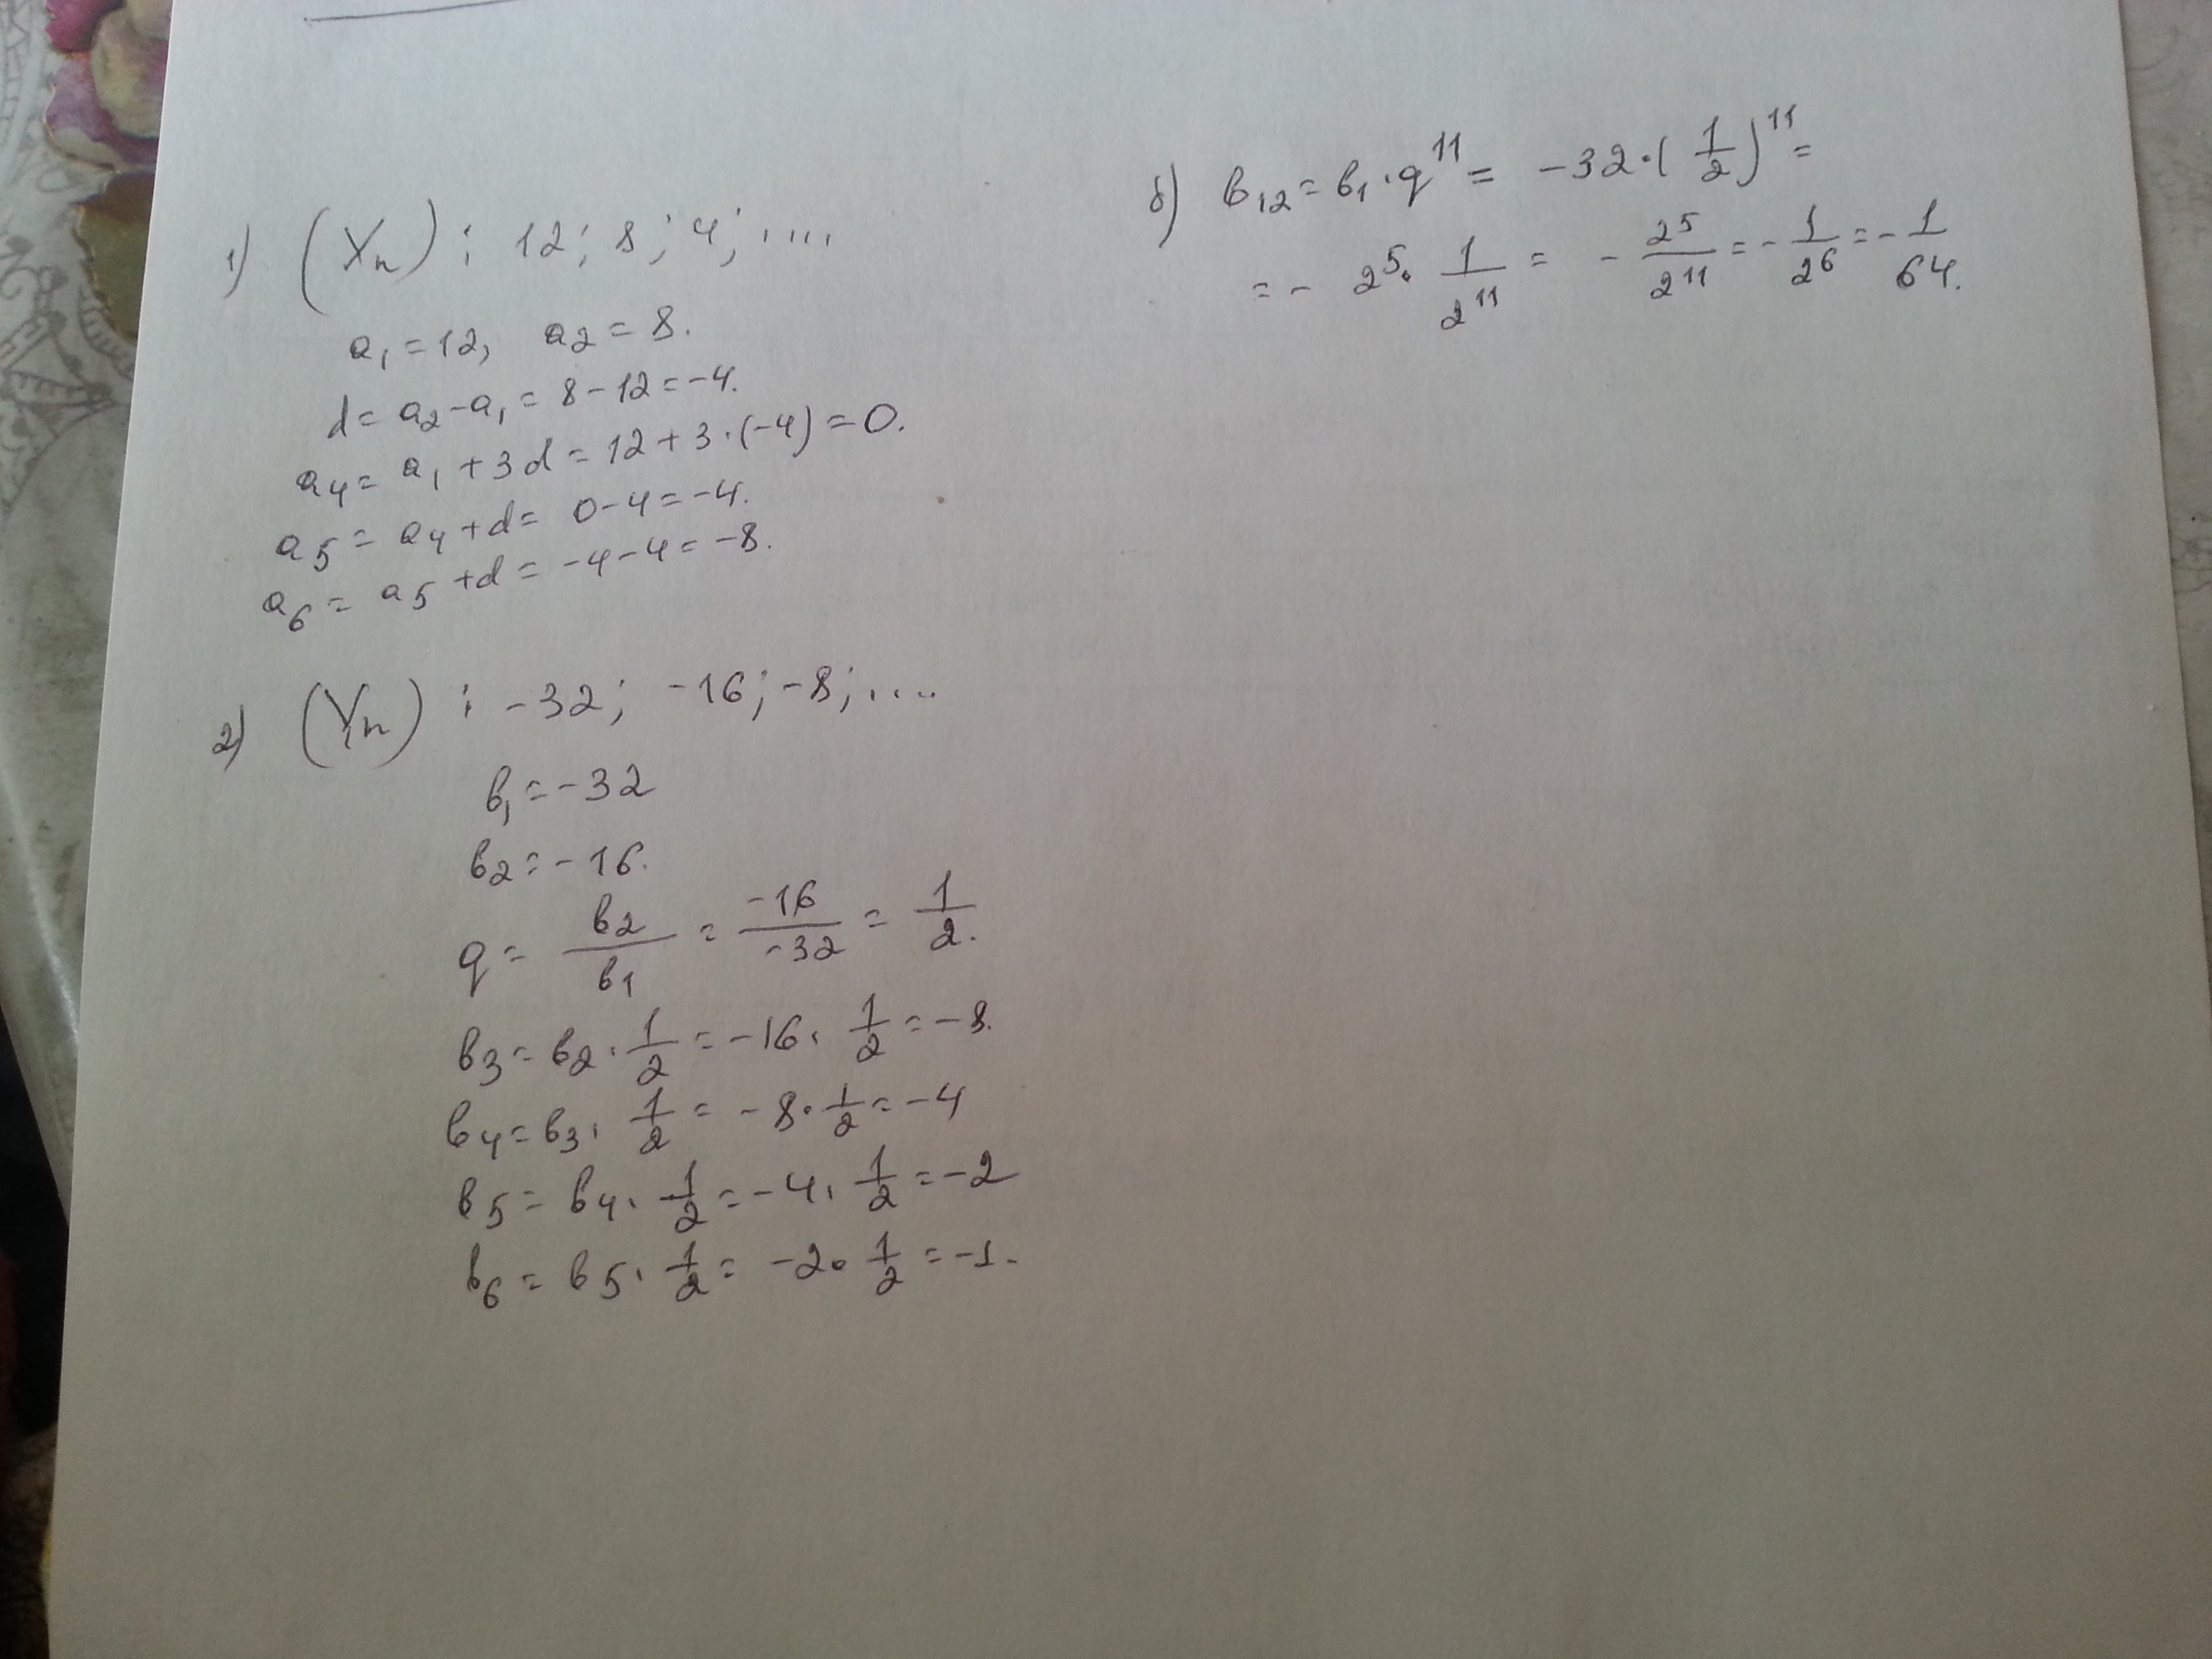 Найдите 12 член геометрической прогрессии